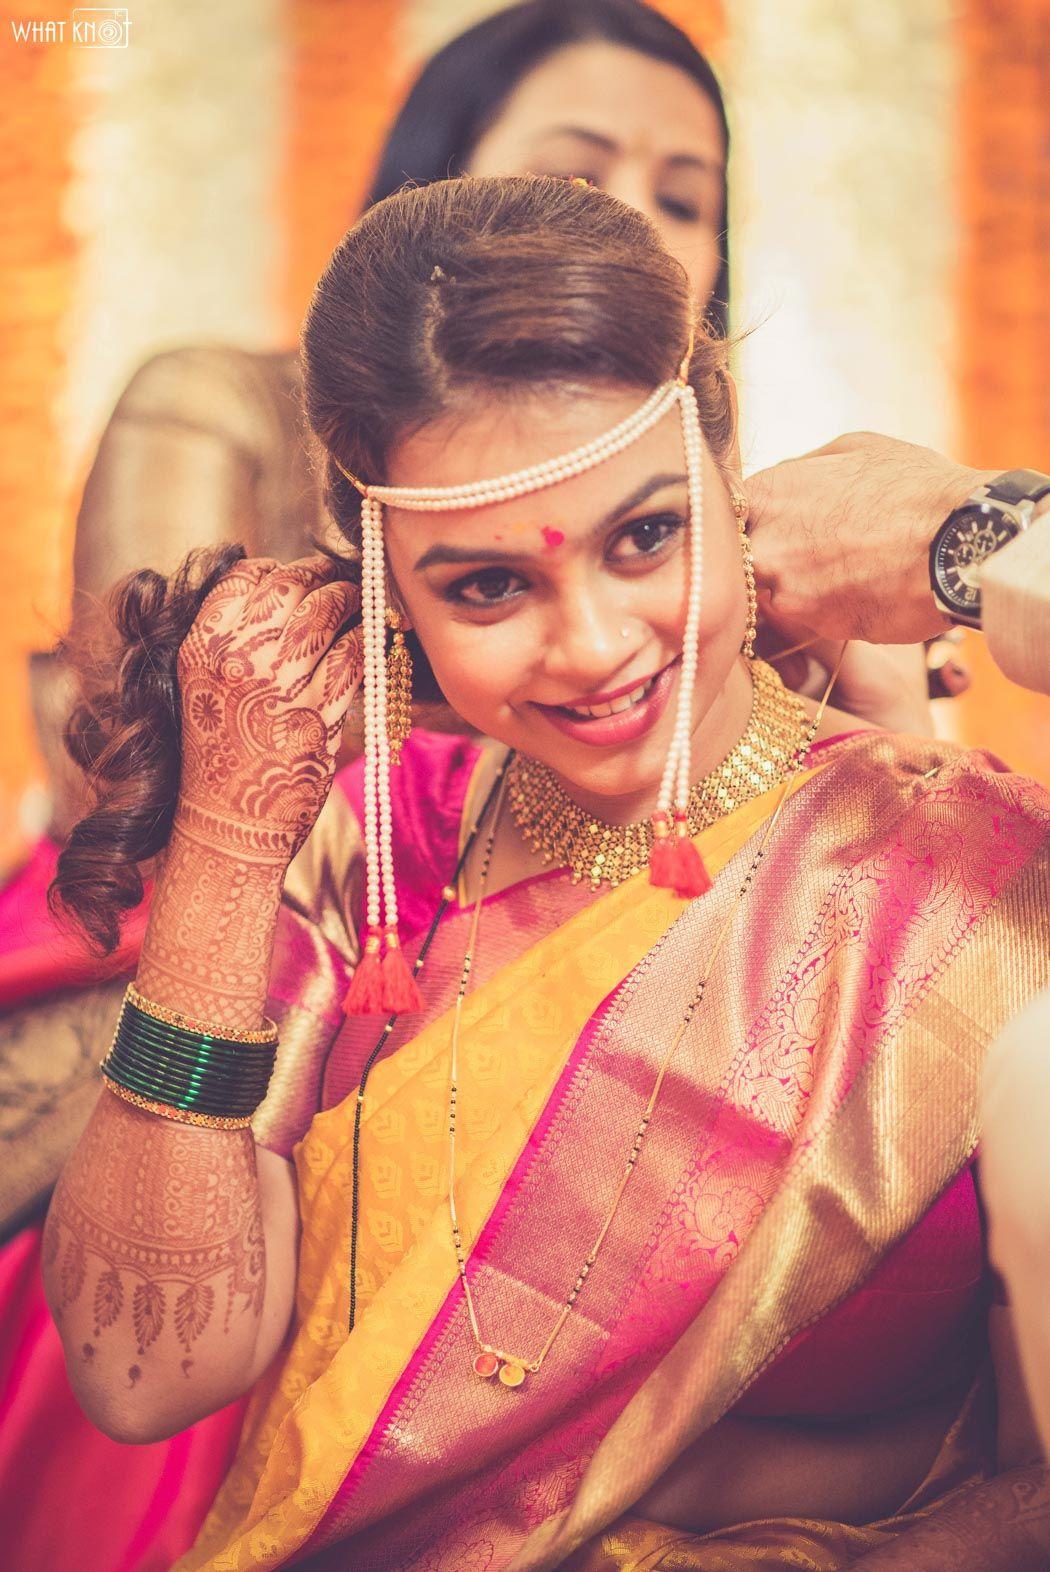 Nauvari on maitreyi navari pinterest wedding bride and